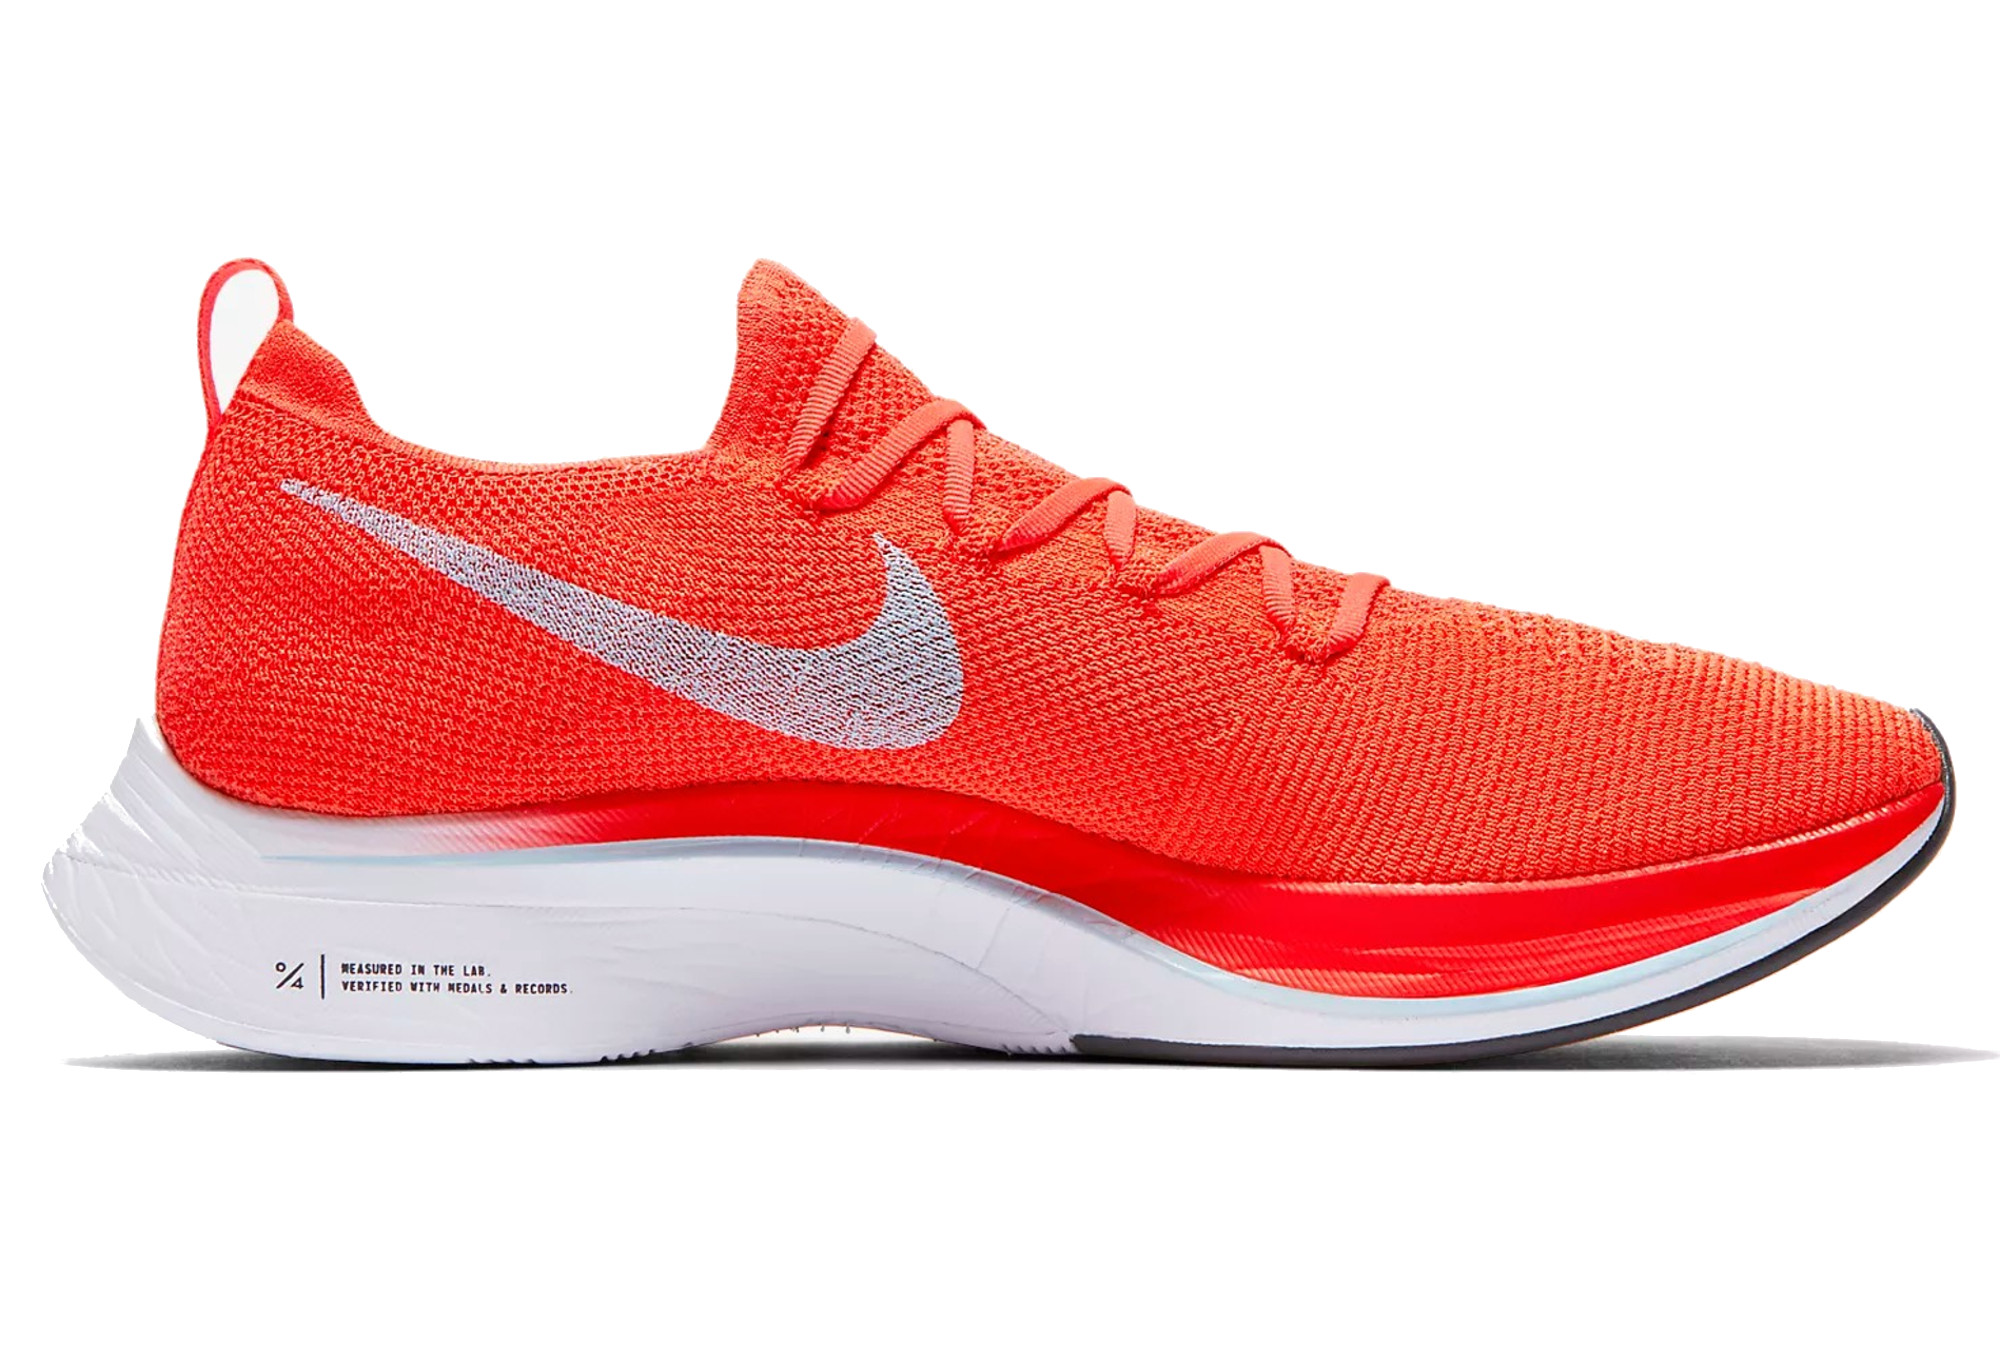 9ffb3ff999435 Zapatillas Nike VaporFly 4 Flyknit Grey Rojo Unisex